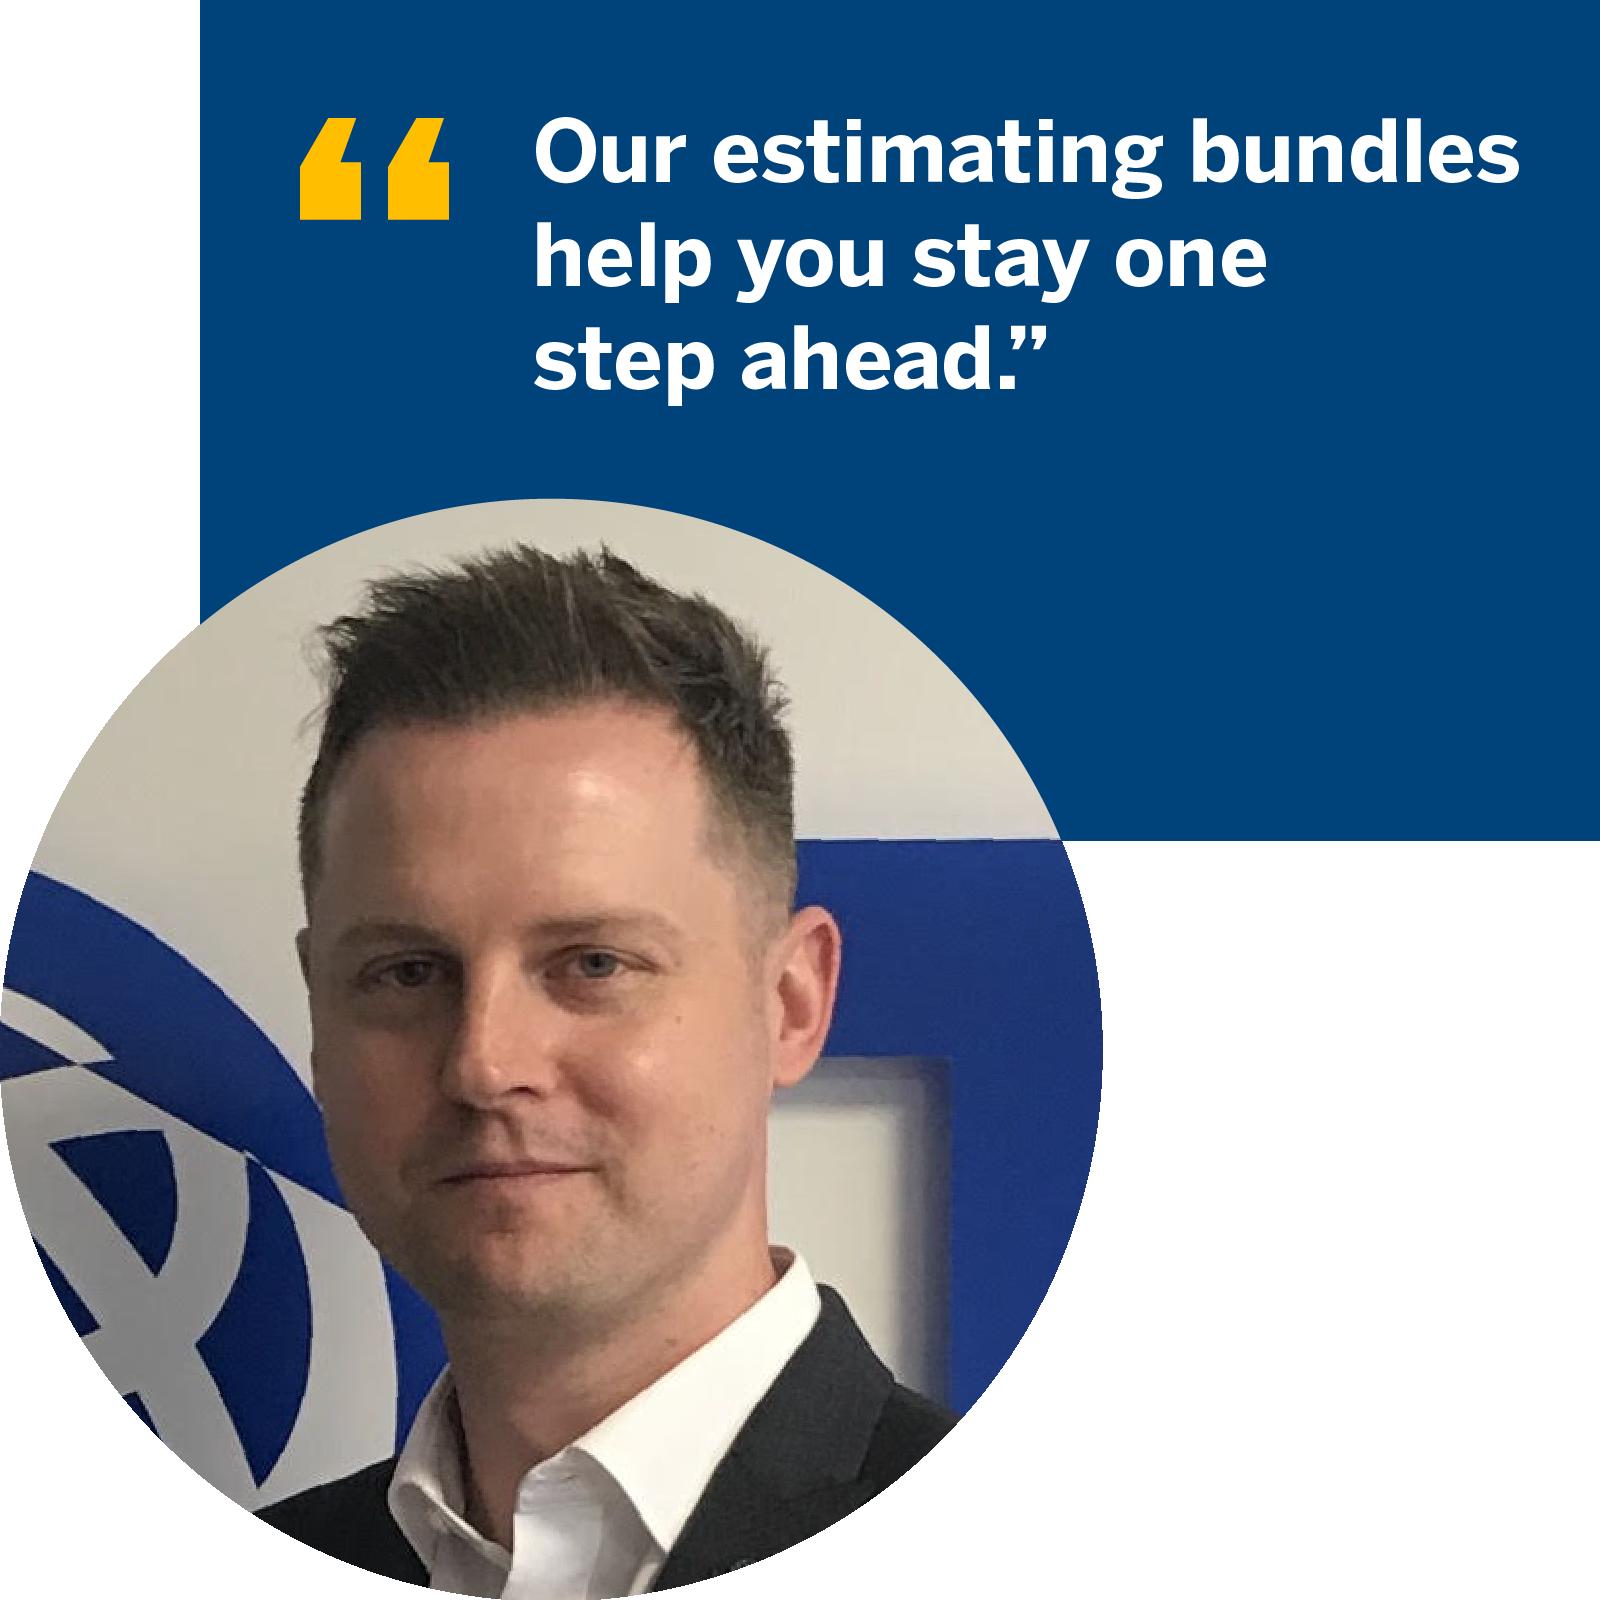 James Hardwick, UK Sales Director Trimble MEP